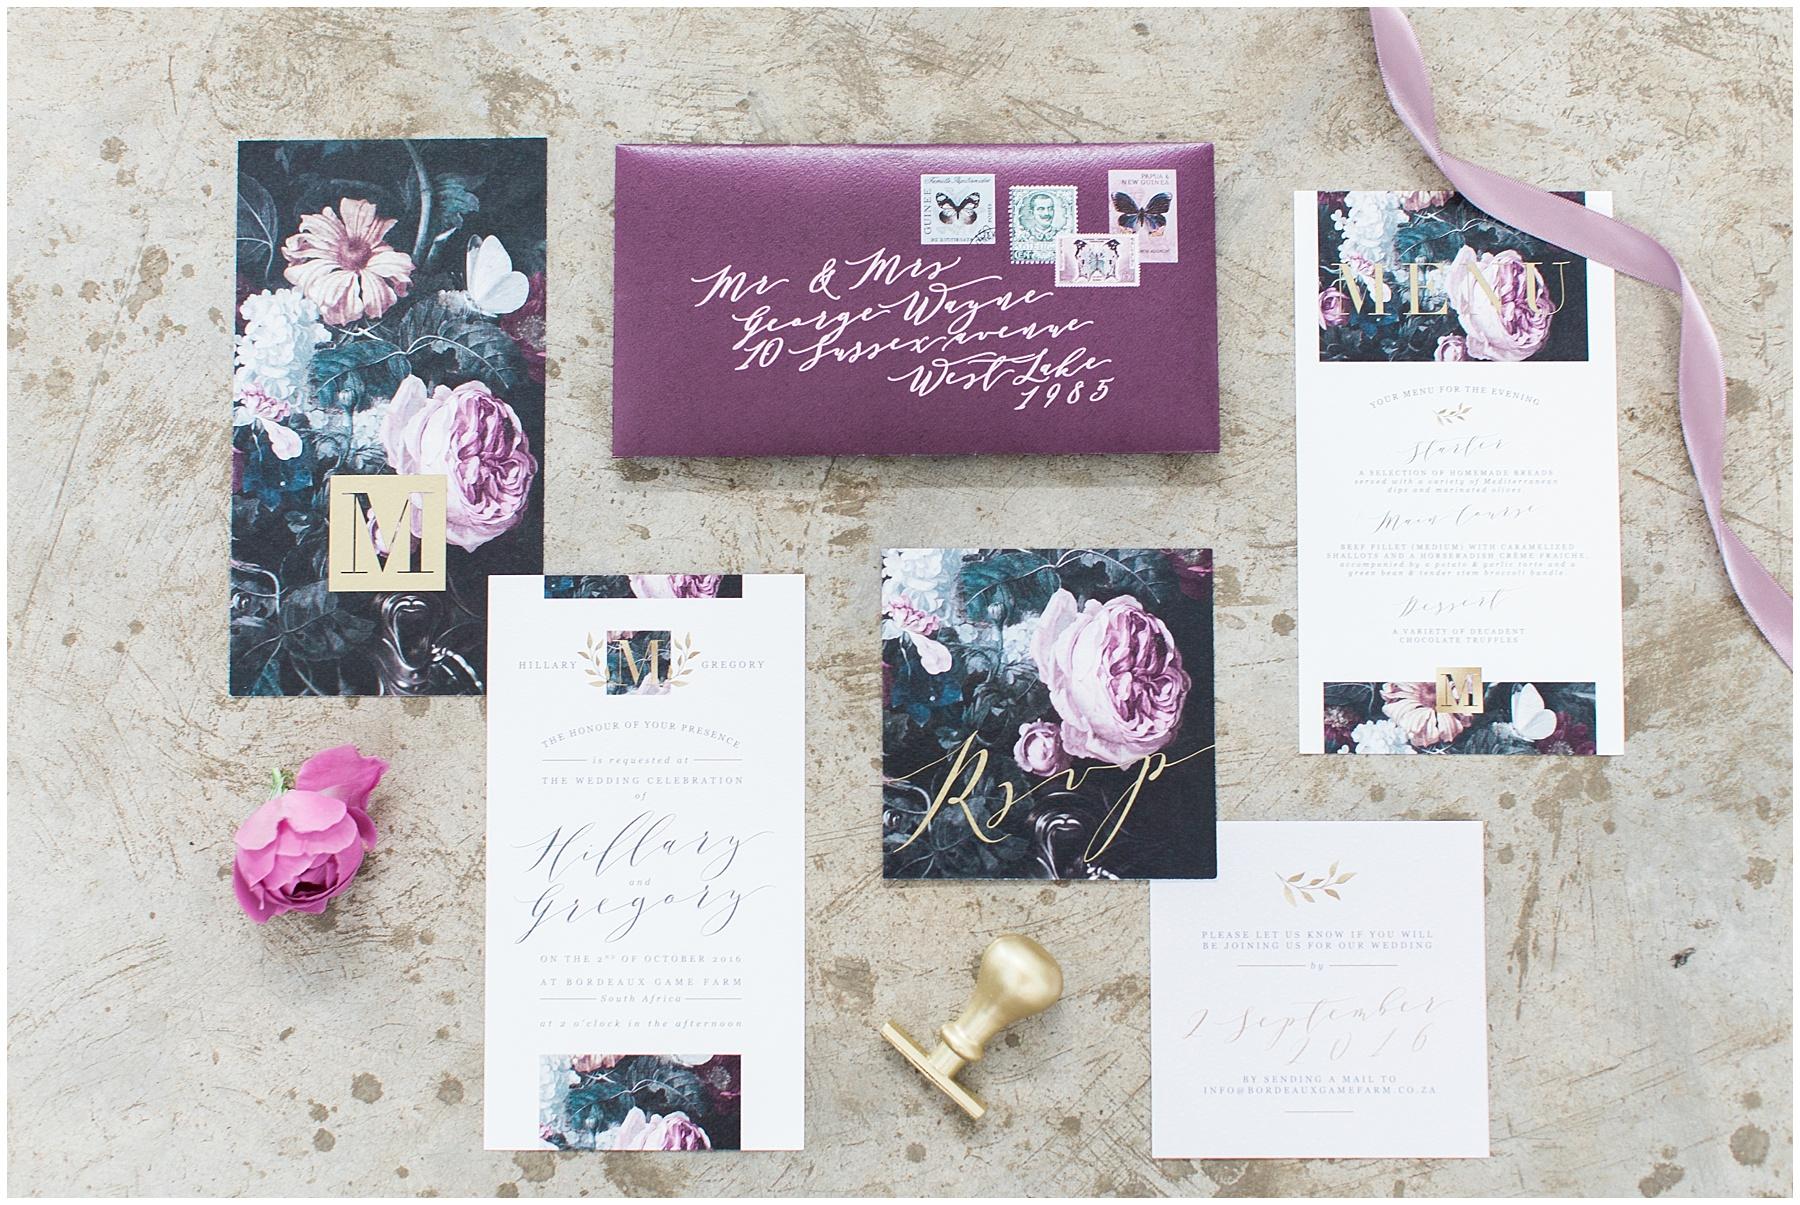 AliciaLandman_JoleneandZander_Wedding_The Pretty Blog_0396.jpg